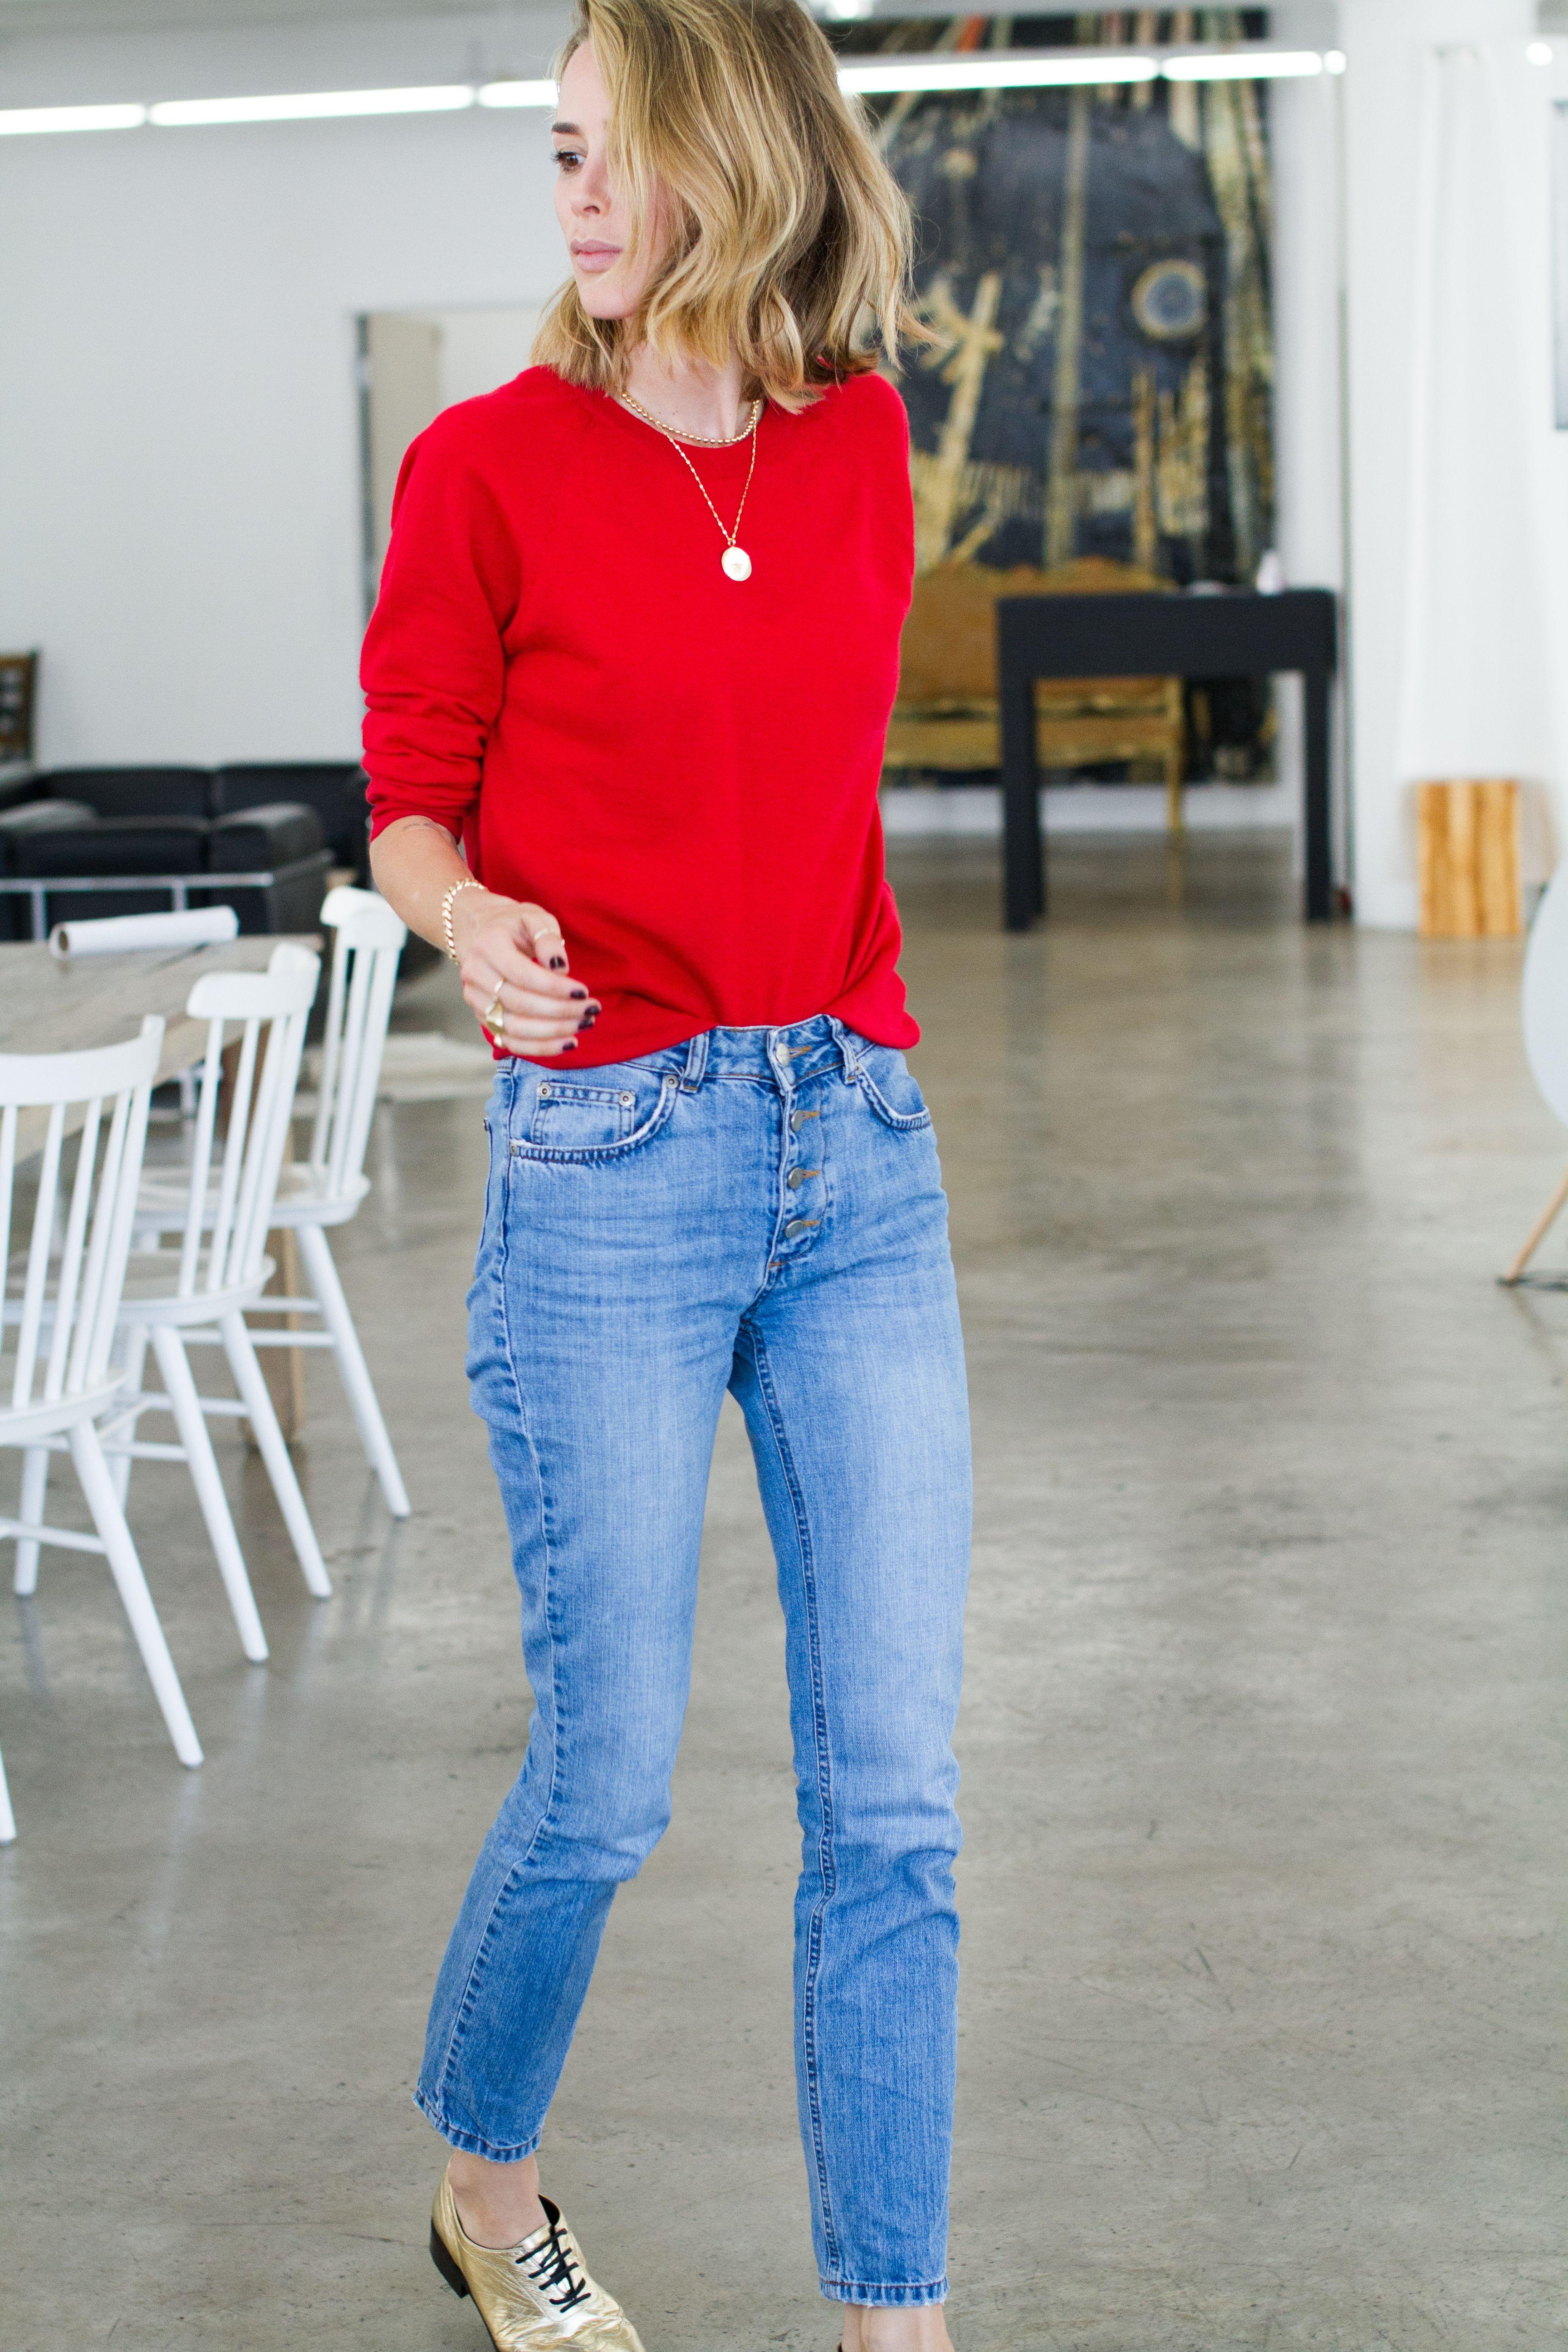 ANINEBING daily look | @aninebing | STYLE | Pinterest | Anine bing ...